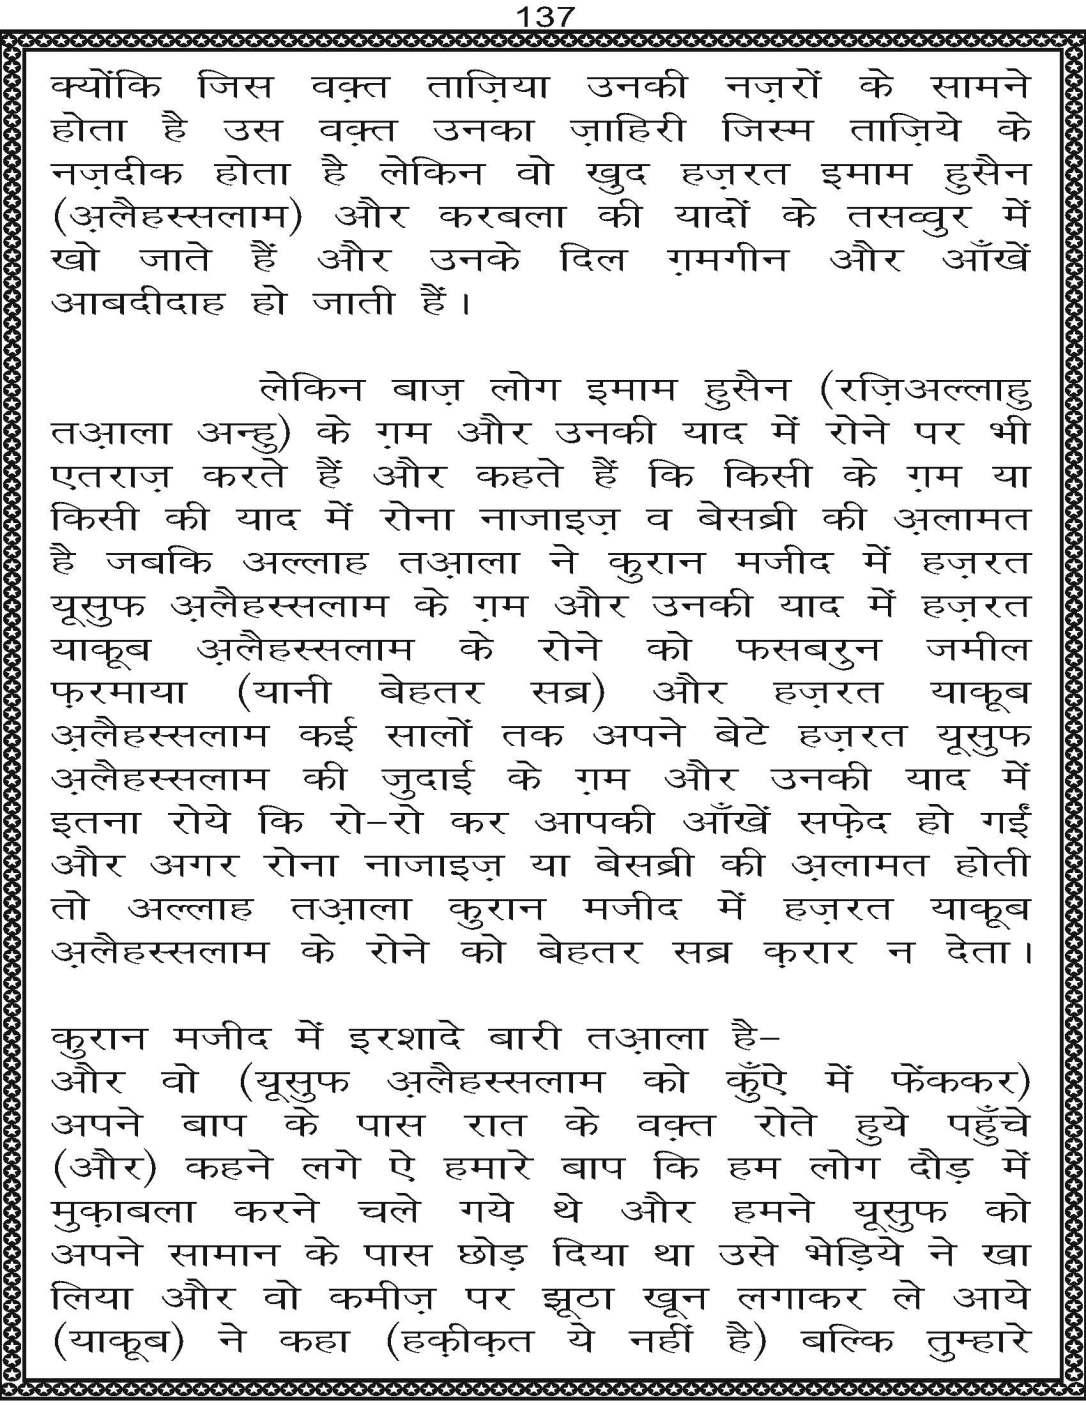 AzmateTaziyadari_Page_137